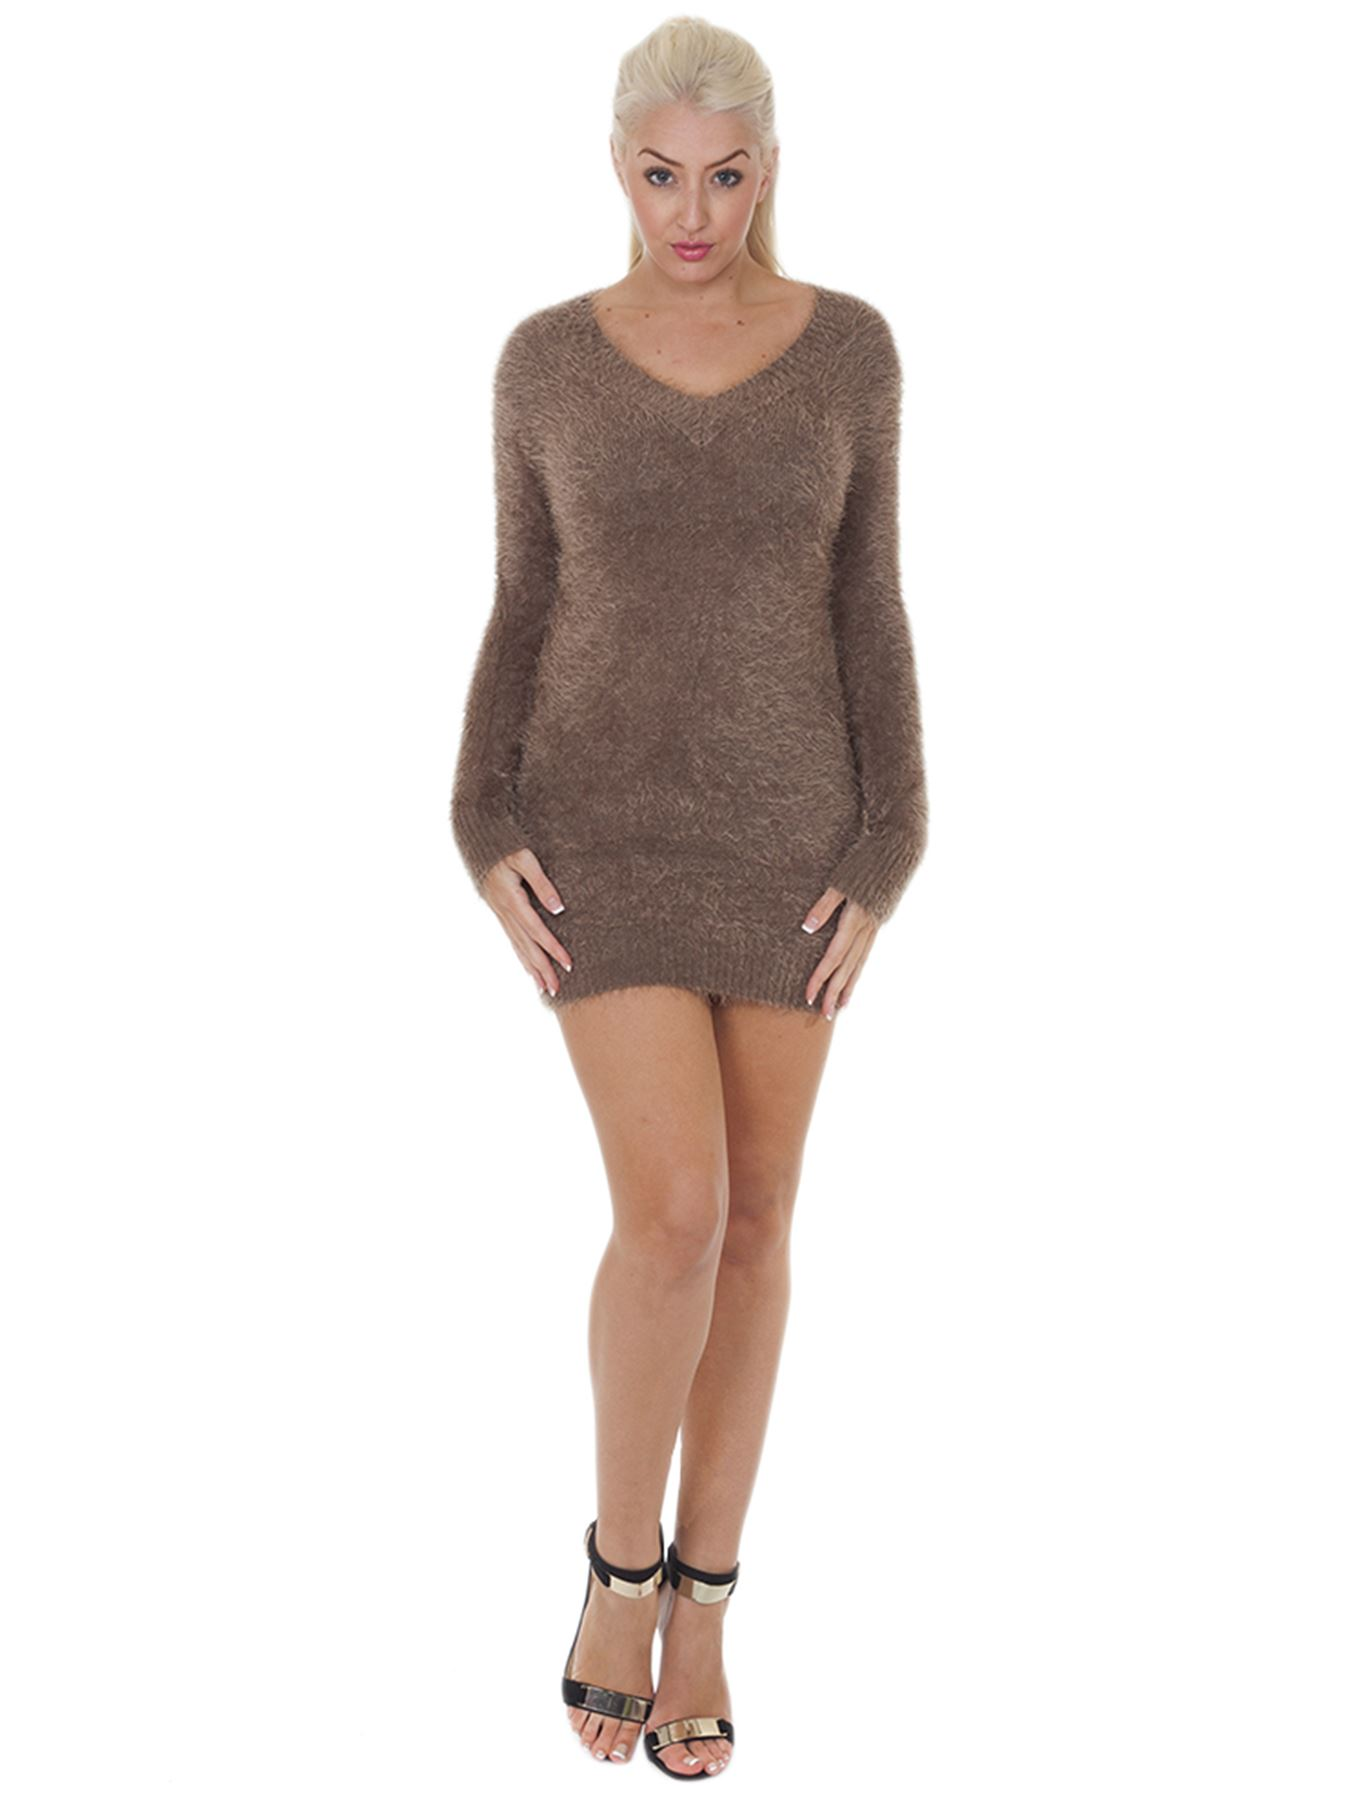 Pull-Femme-Femmes-Tricote-Cardigans-Plain-Tricot-Moelleux-Col-V-Manches-Longues miniature 21